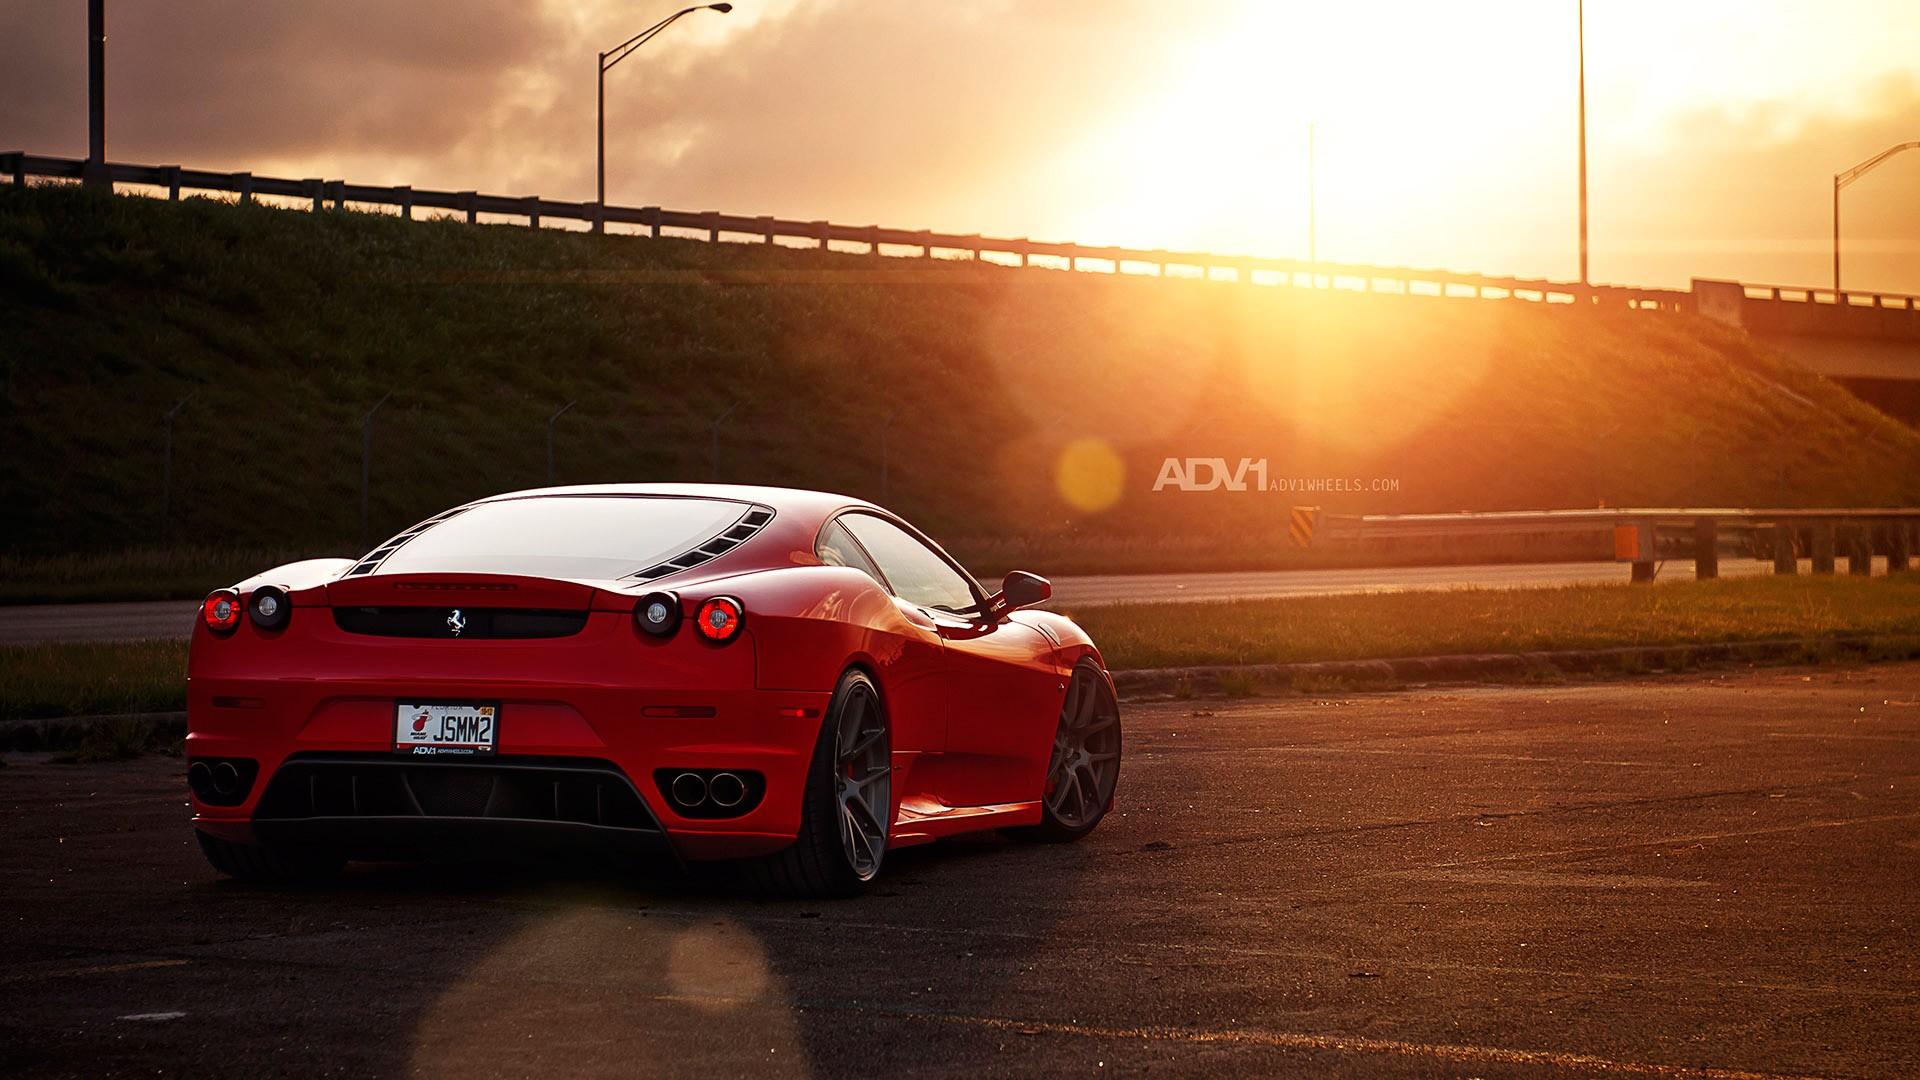 Car Wallpapers Backgrounds Hd: ADV1 Wheels Ferrari F430 Wallpaper